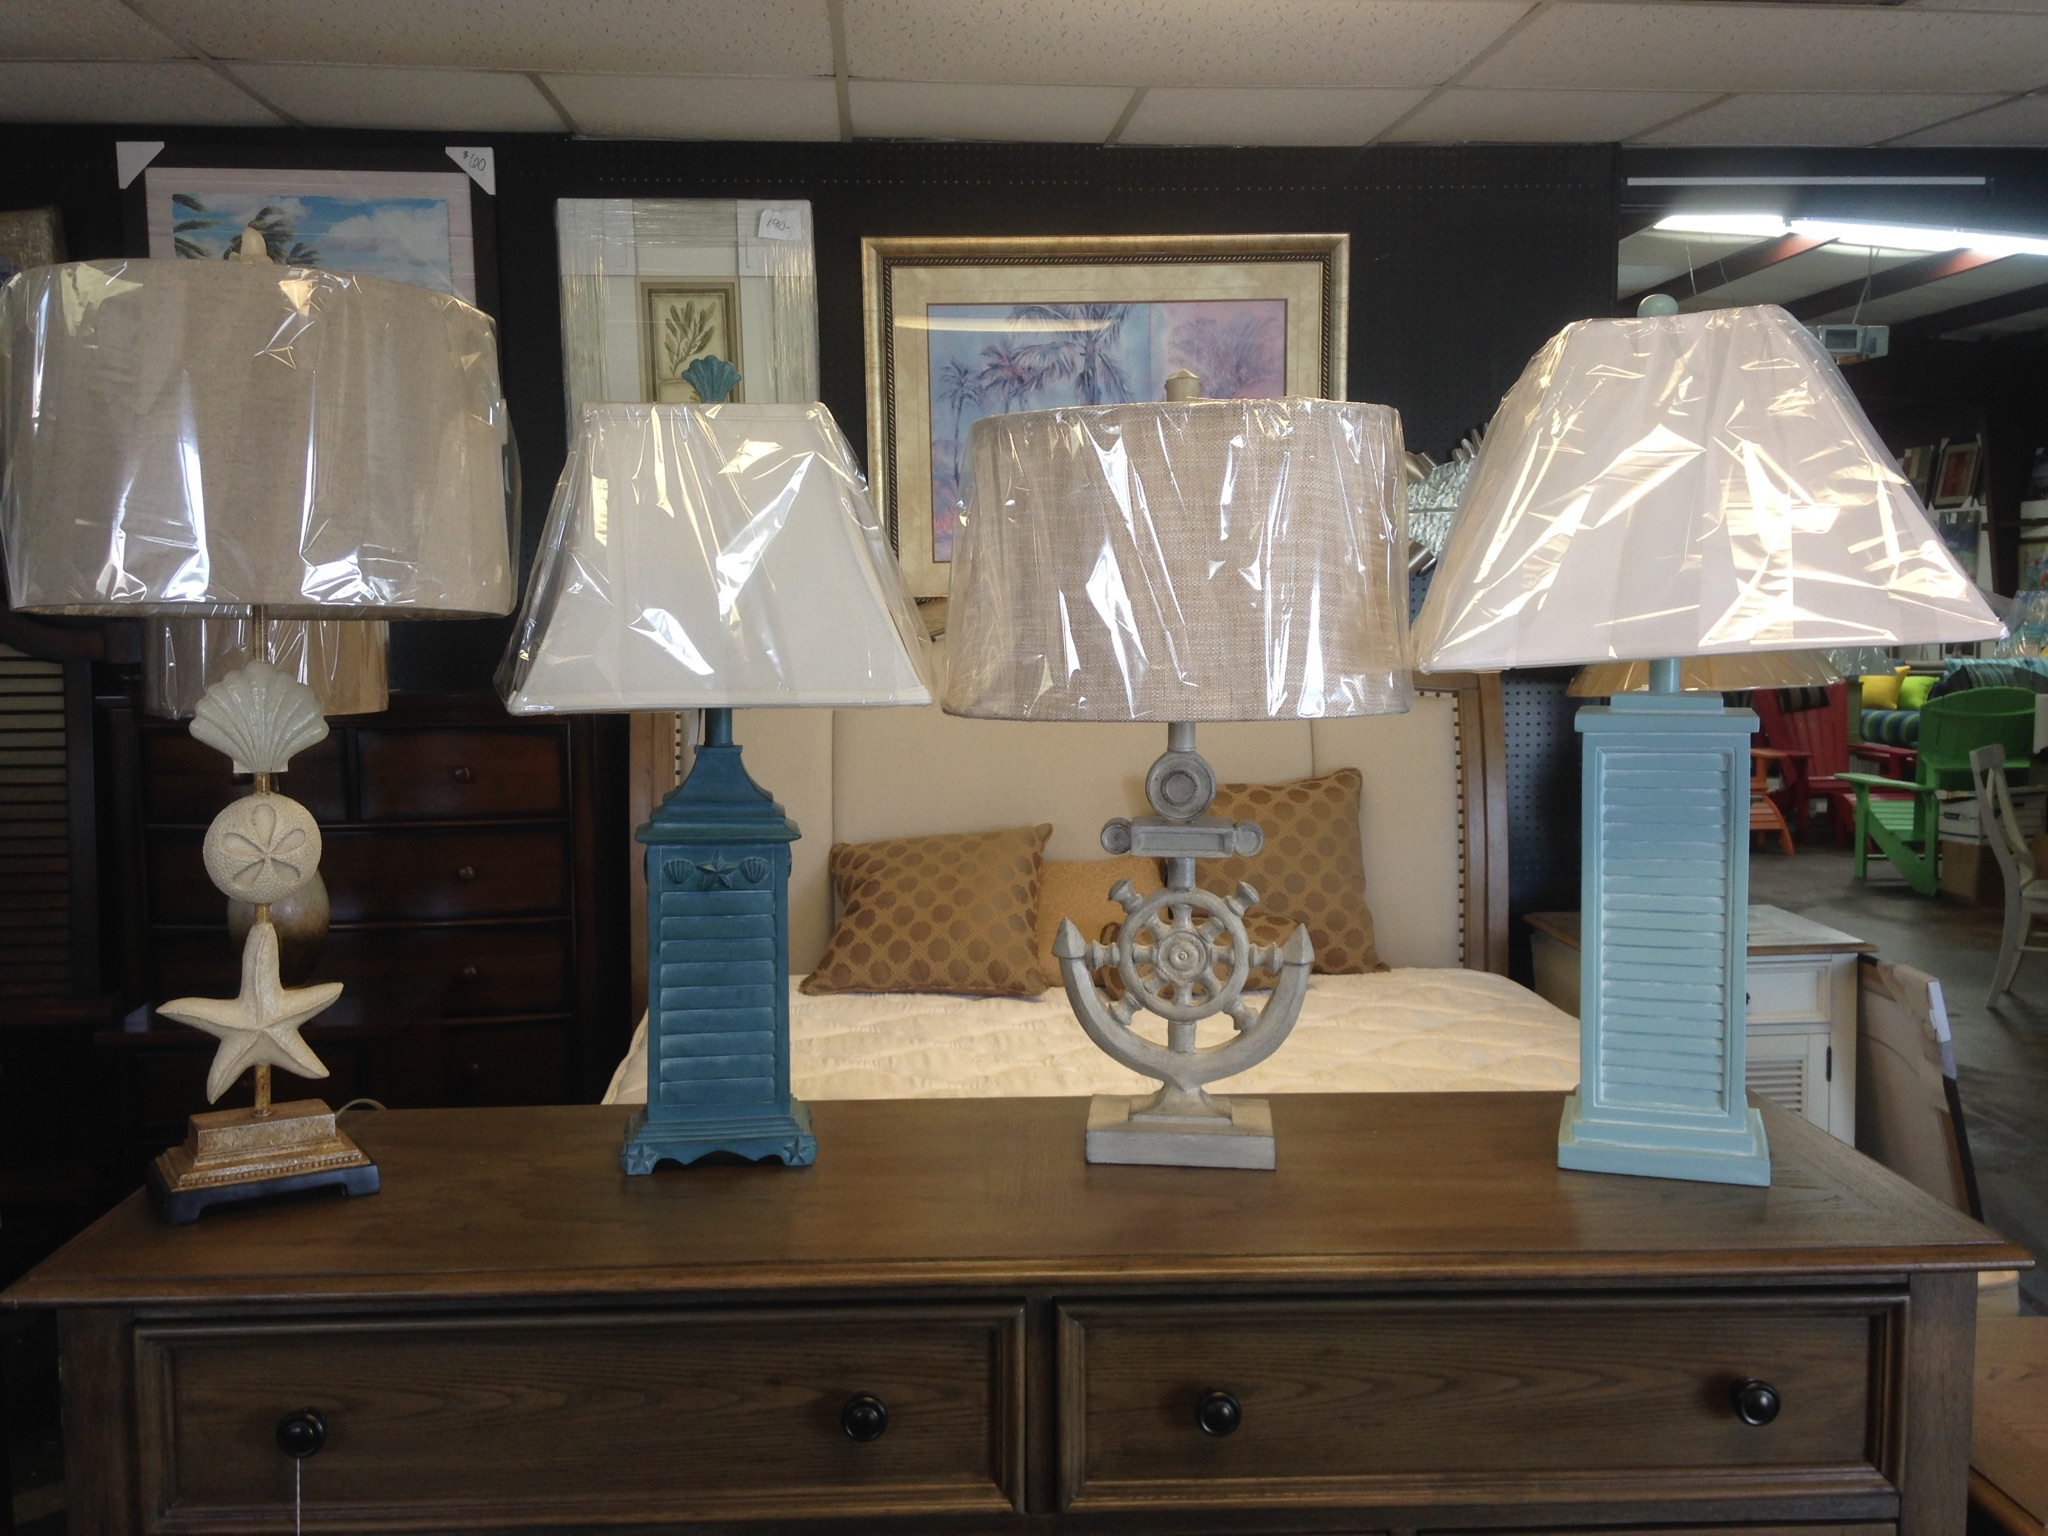 Unique Lamps   Furniture Accessories Supplier in Panama, FL.